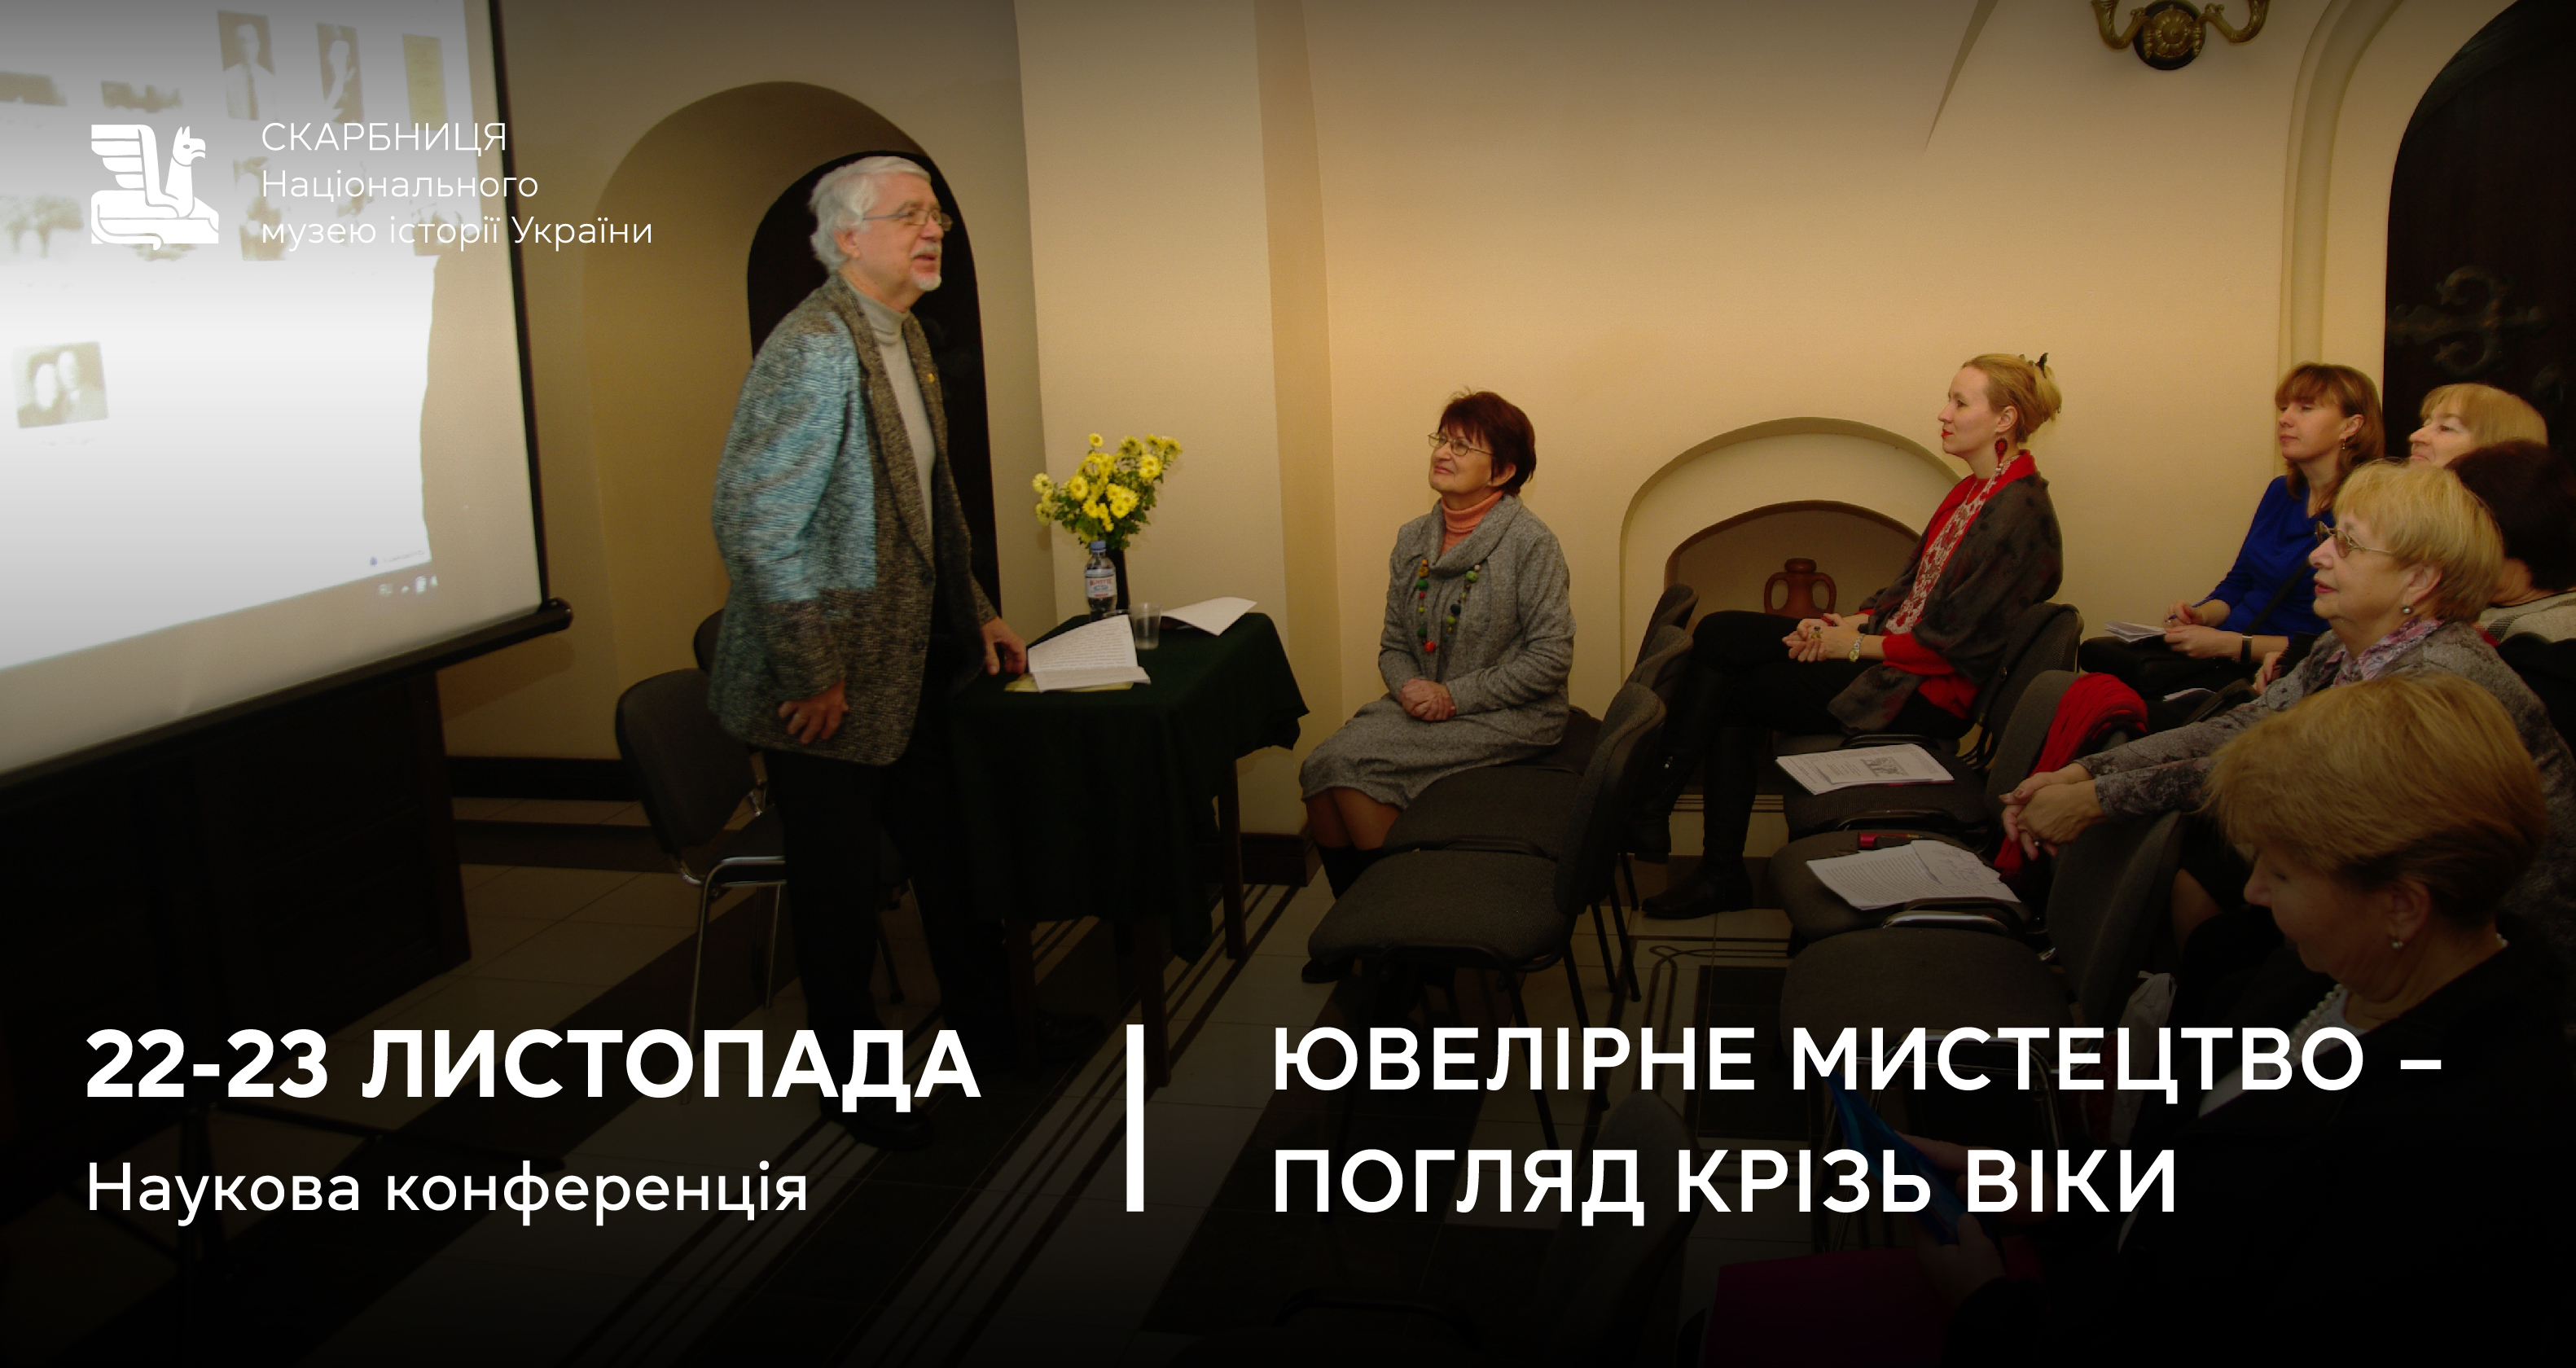 https://goldenukr.com.ua/ffiles/afisha/2021_events/um_poglyad_2021_1.jpg